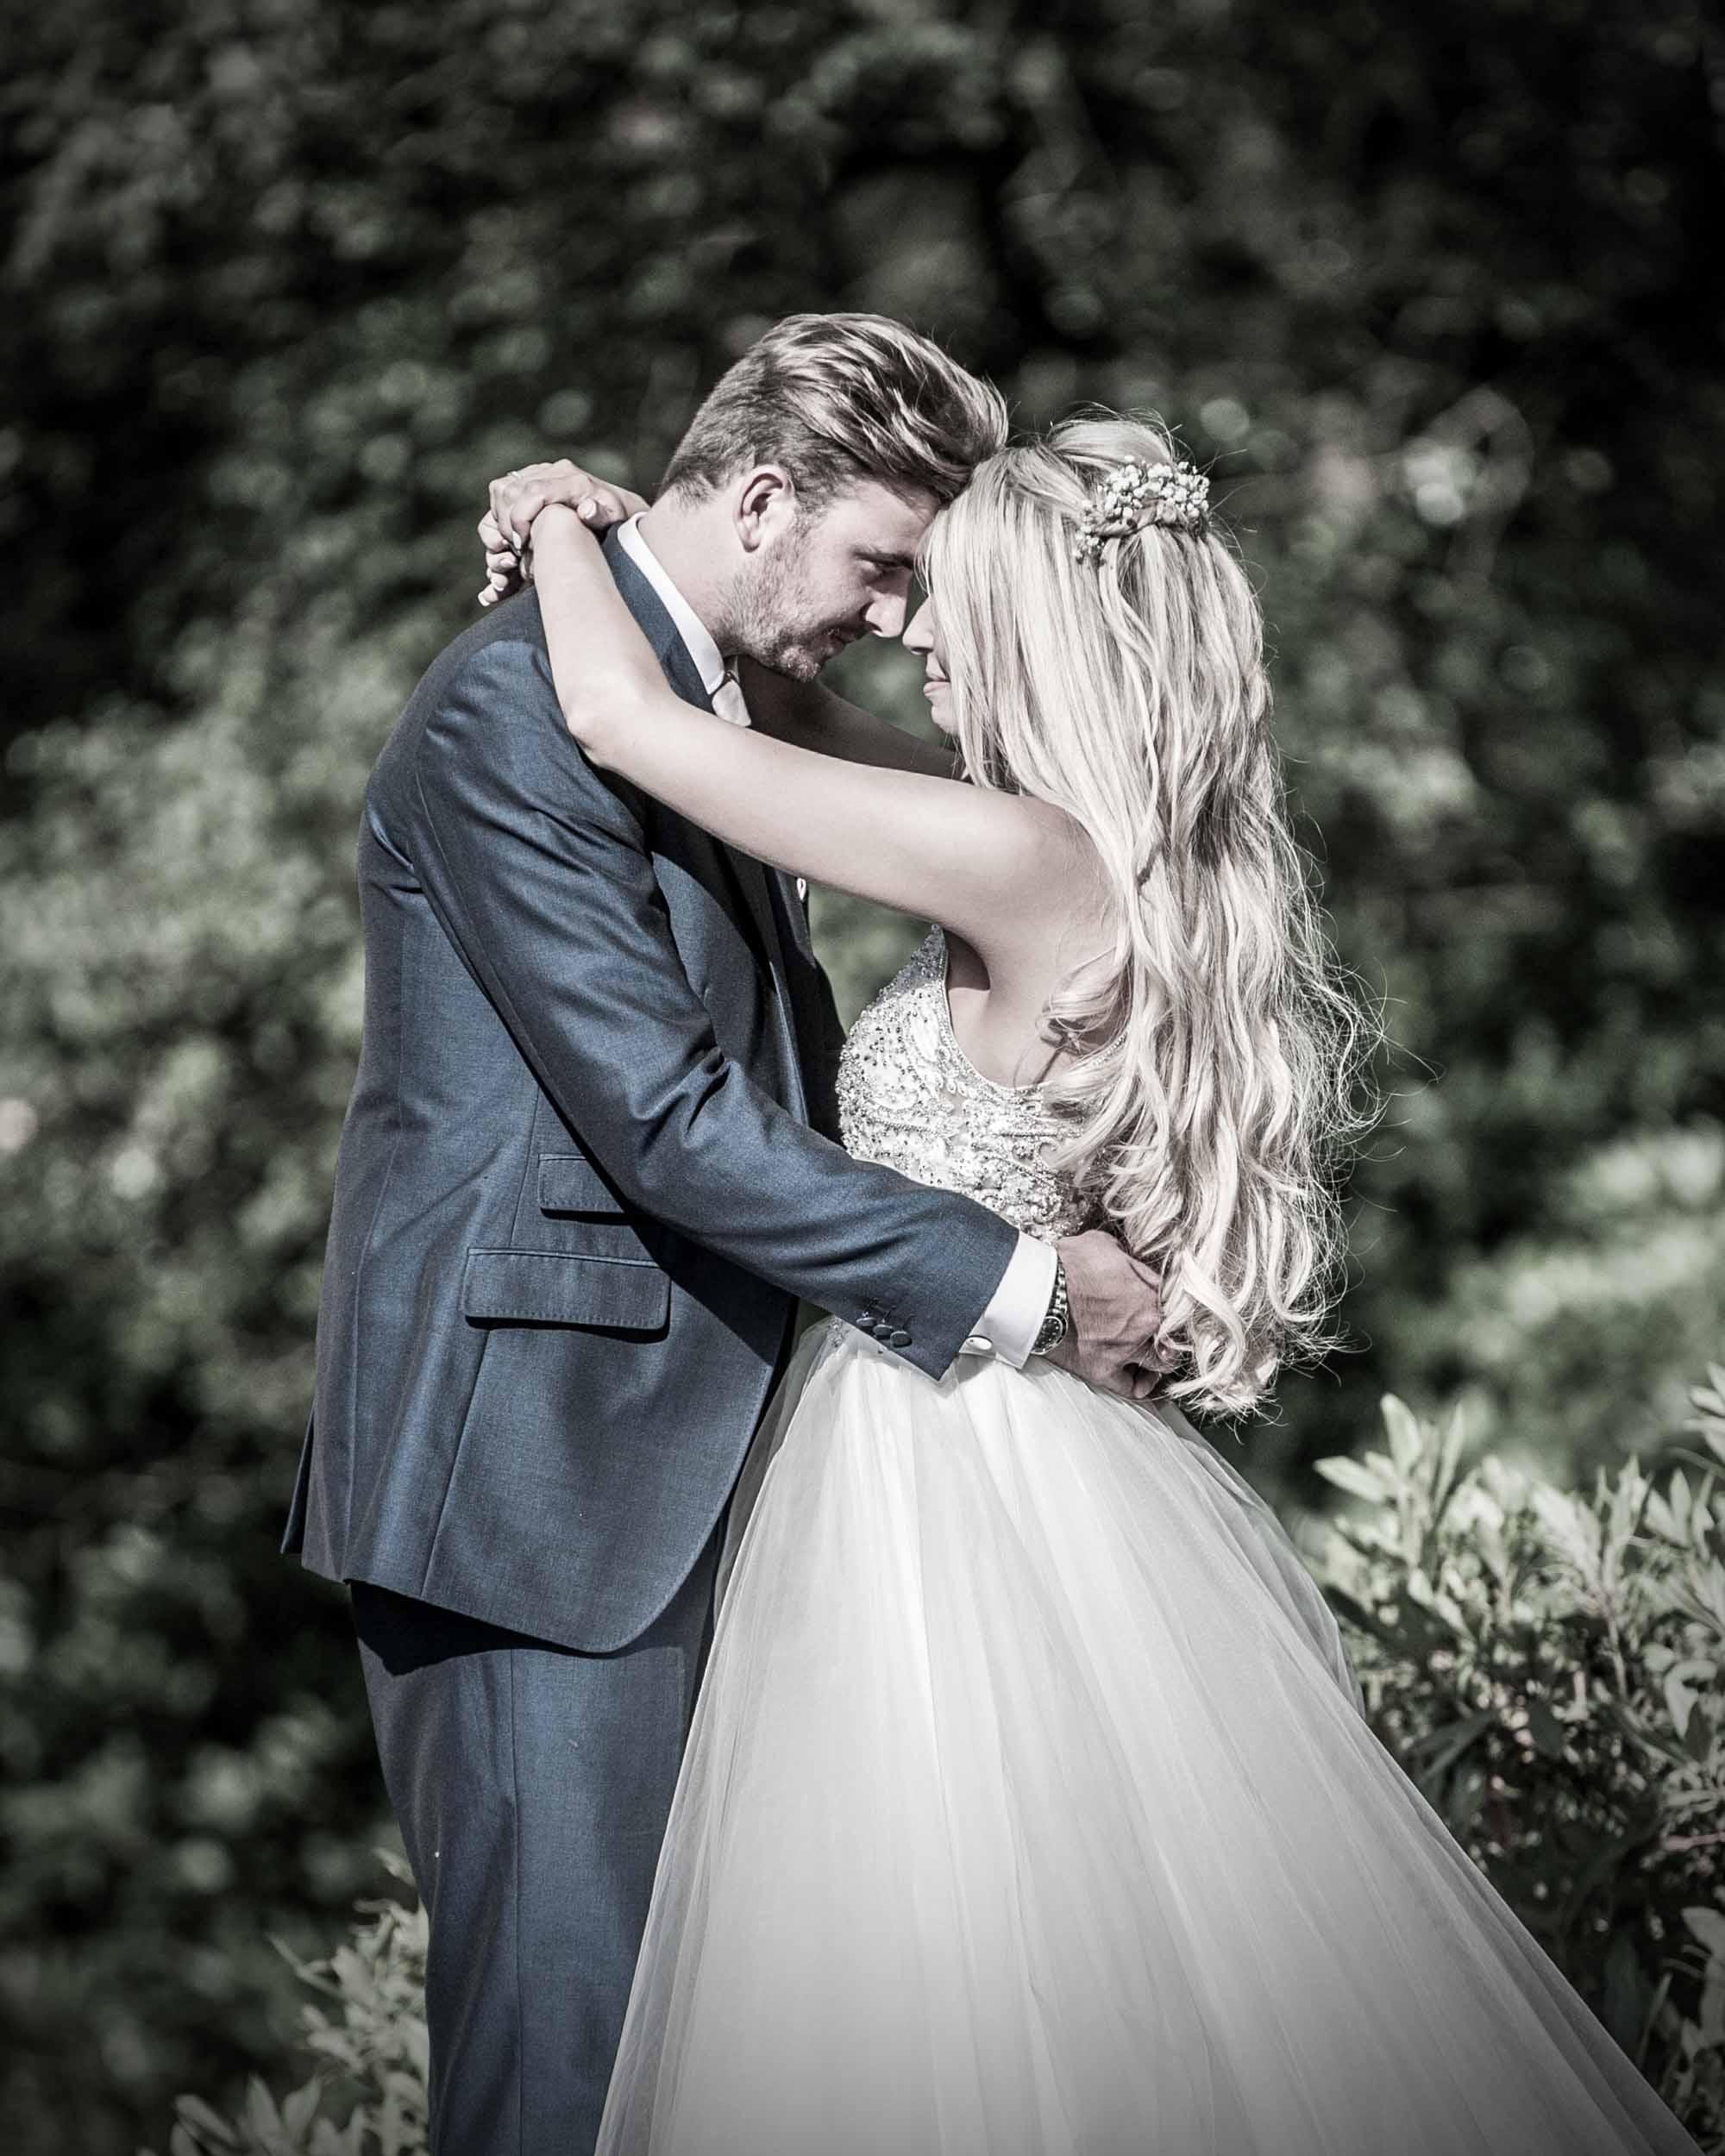 Emma&Victorwedding_0065_edited-1